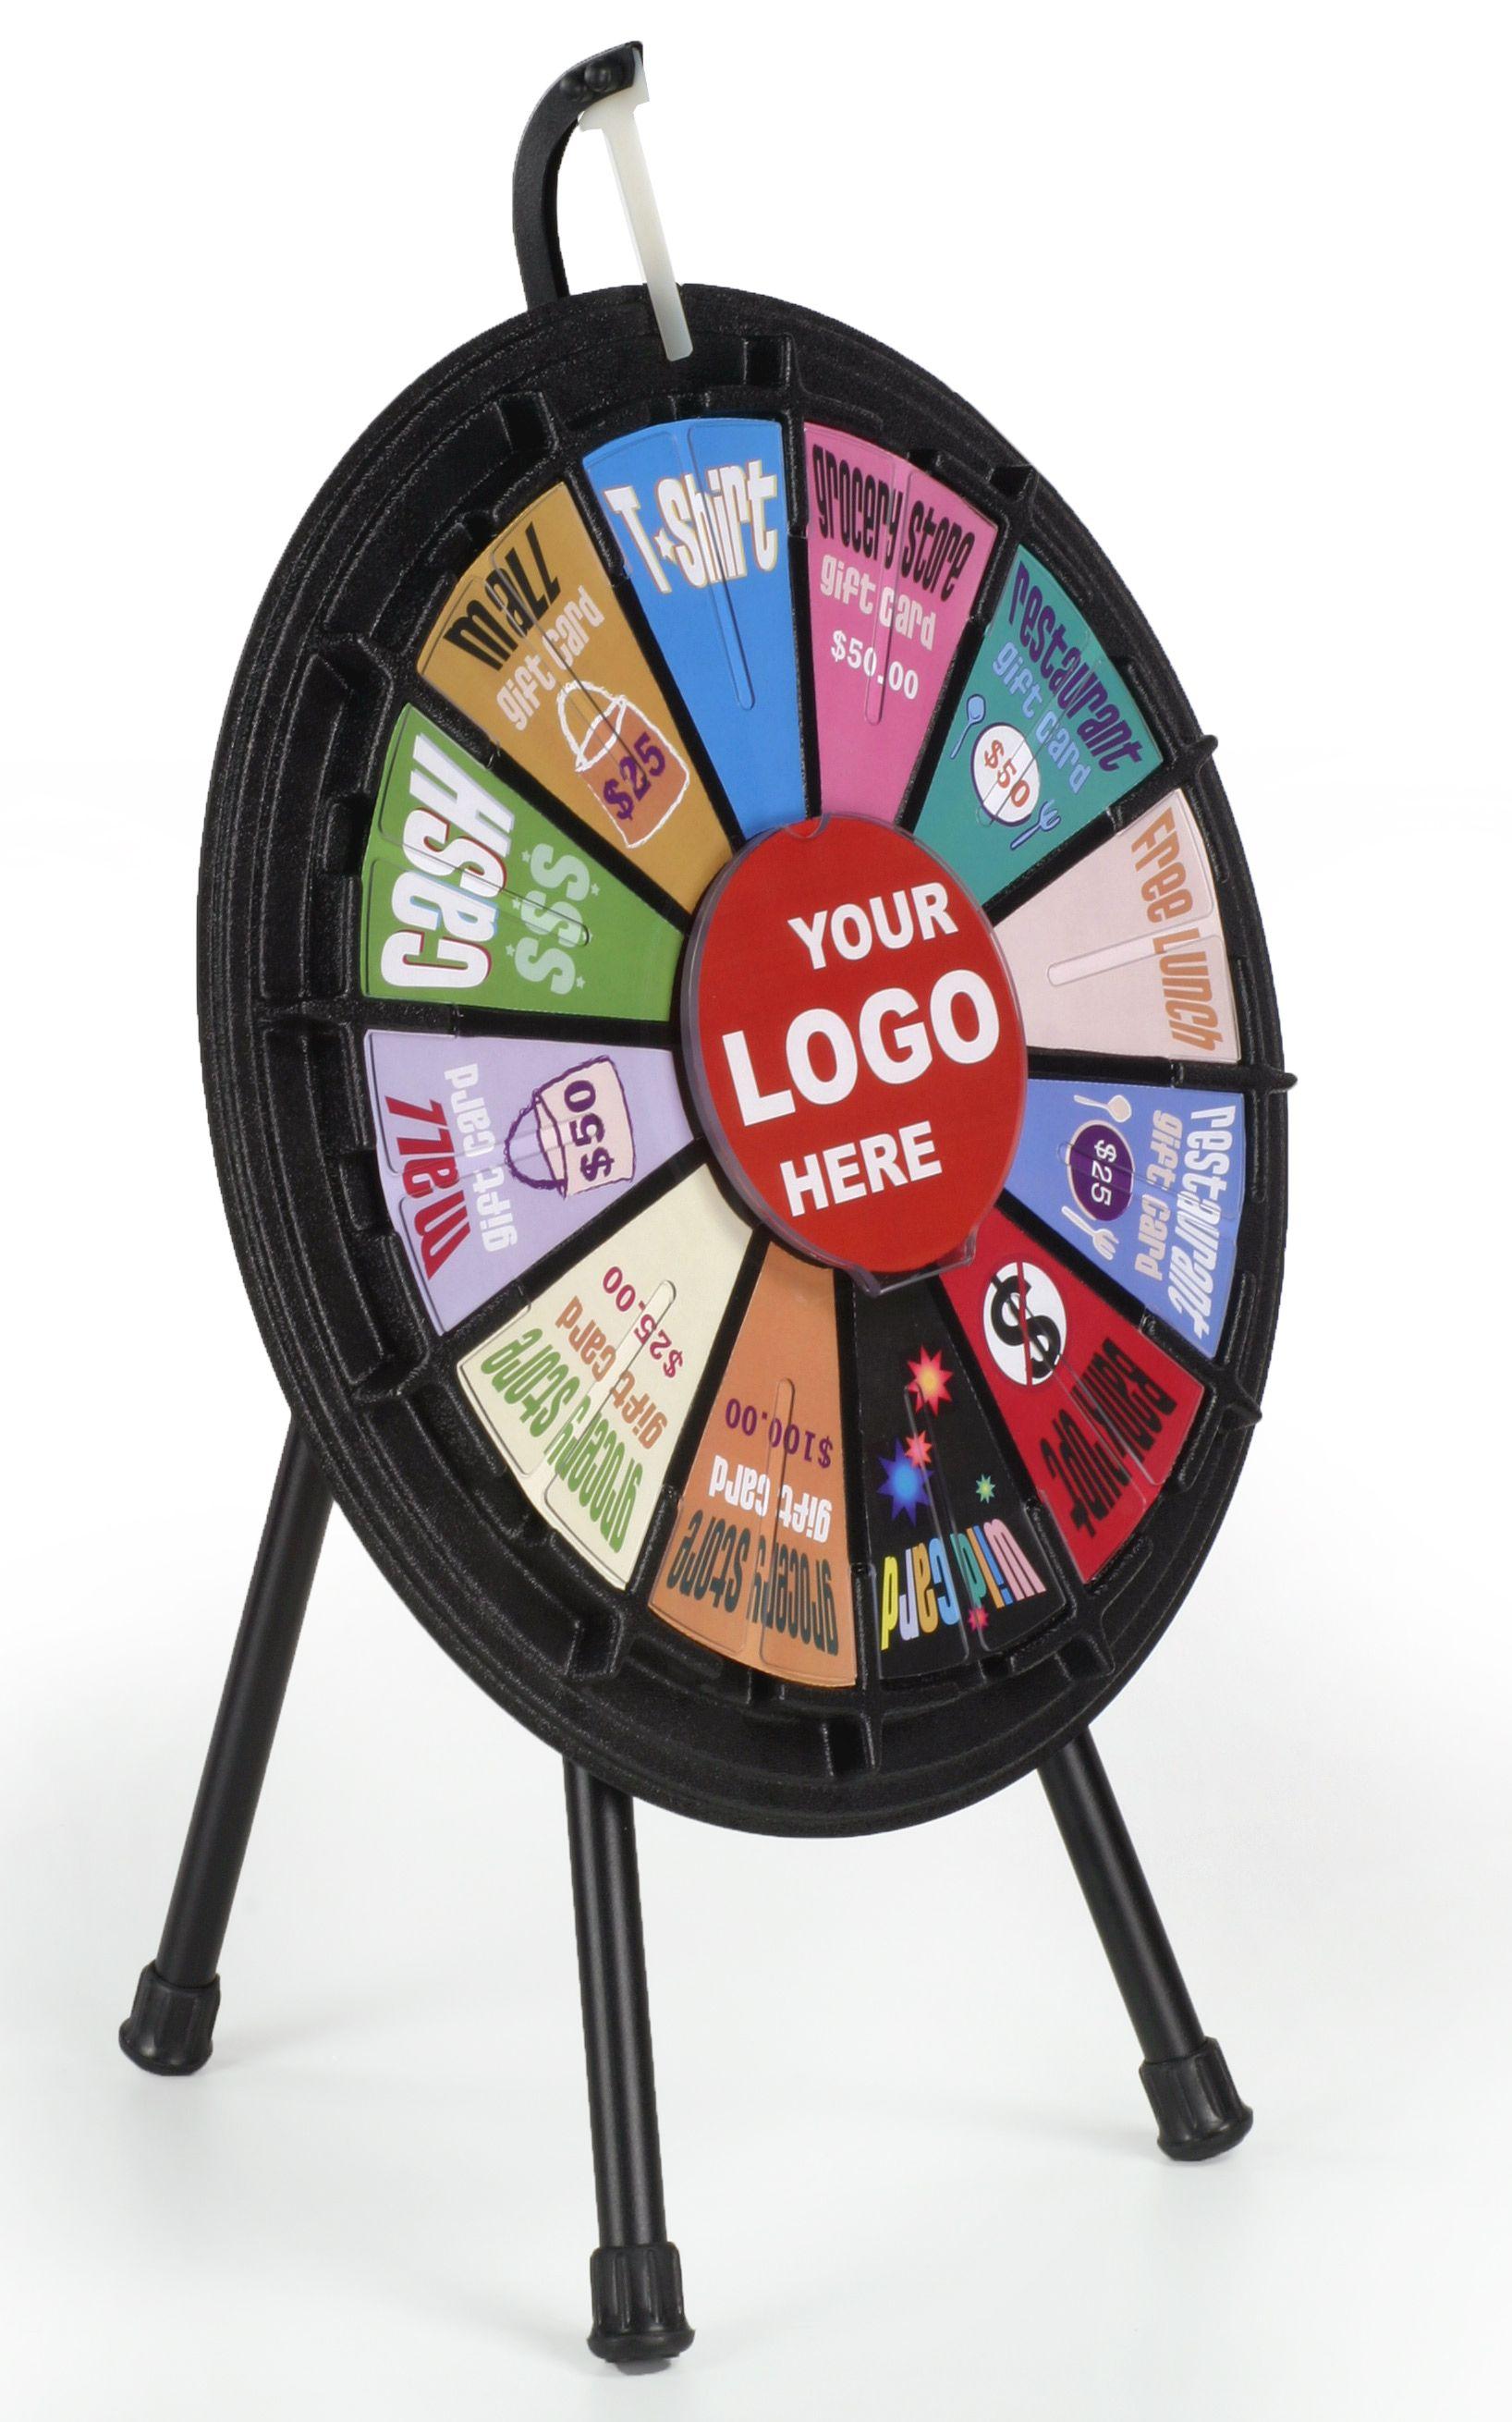 Mini Prize Wheel With 12 Slots Printable Templates Countertop Black Prize Wheel Spinning Wheel Game Spinning Wheel